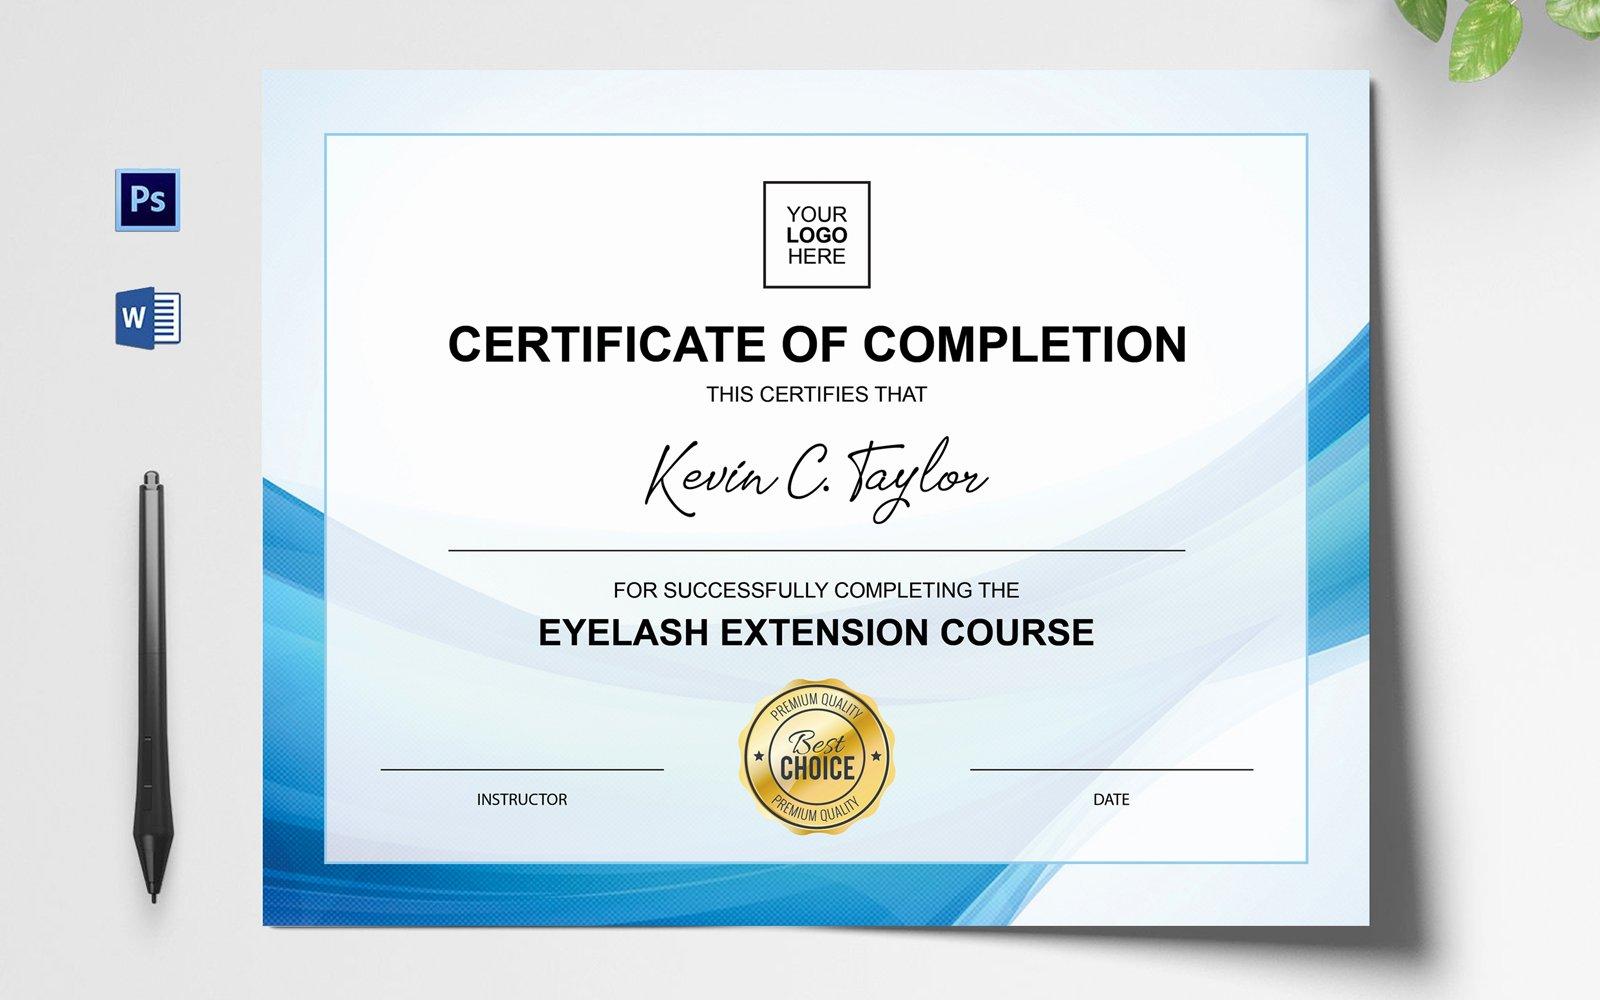 Eyelash Extension Certificate Template 152234